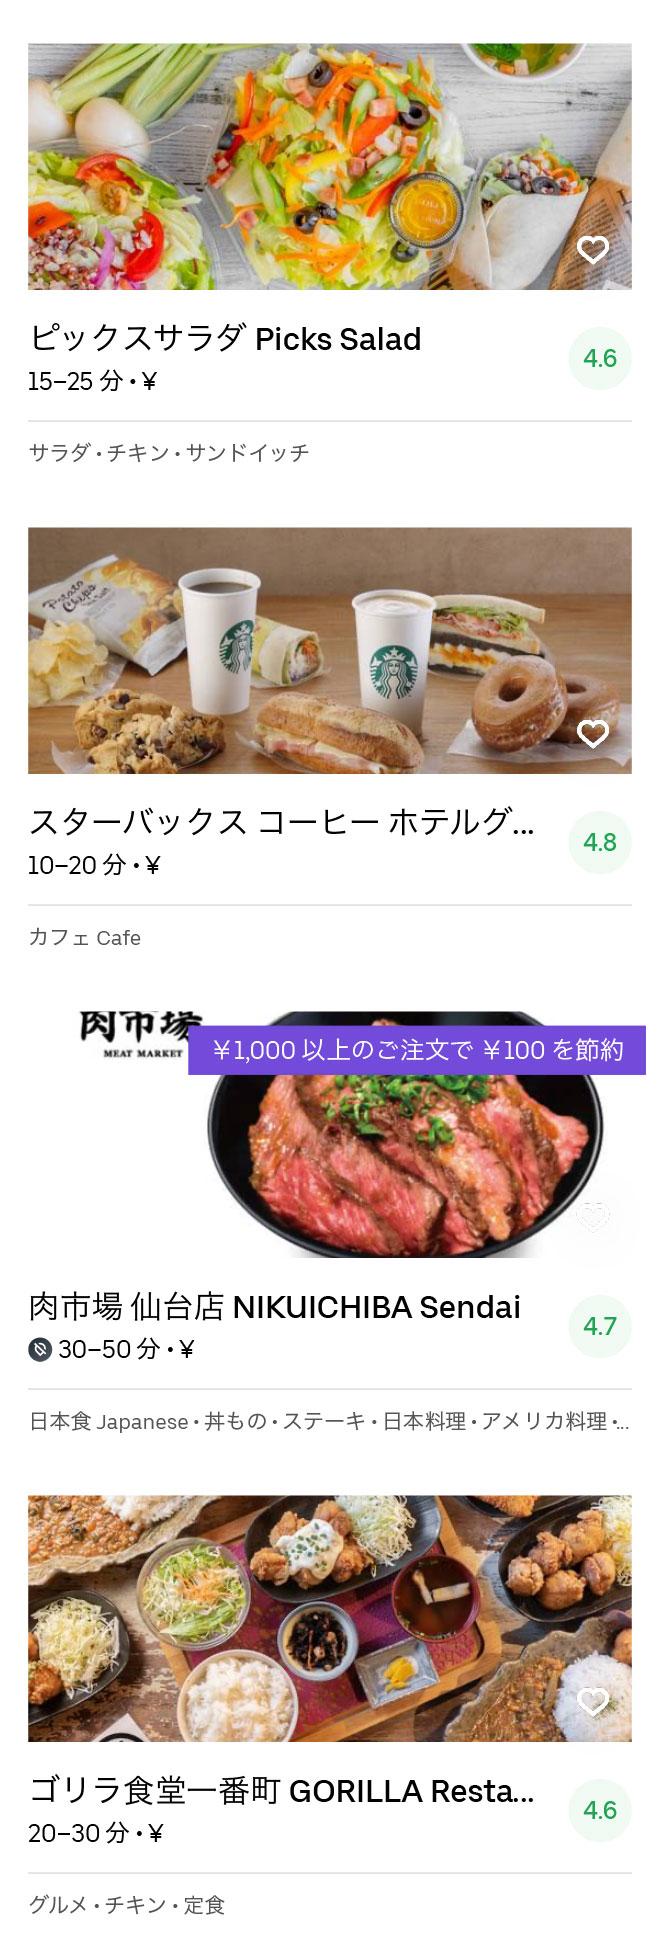 Sendai menu 200404